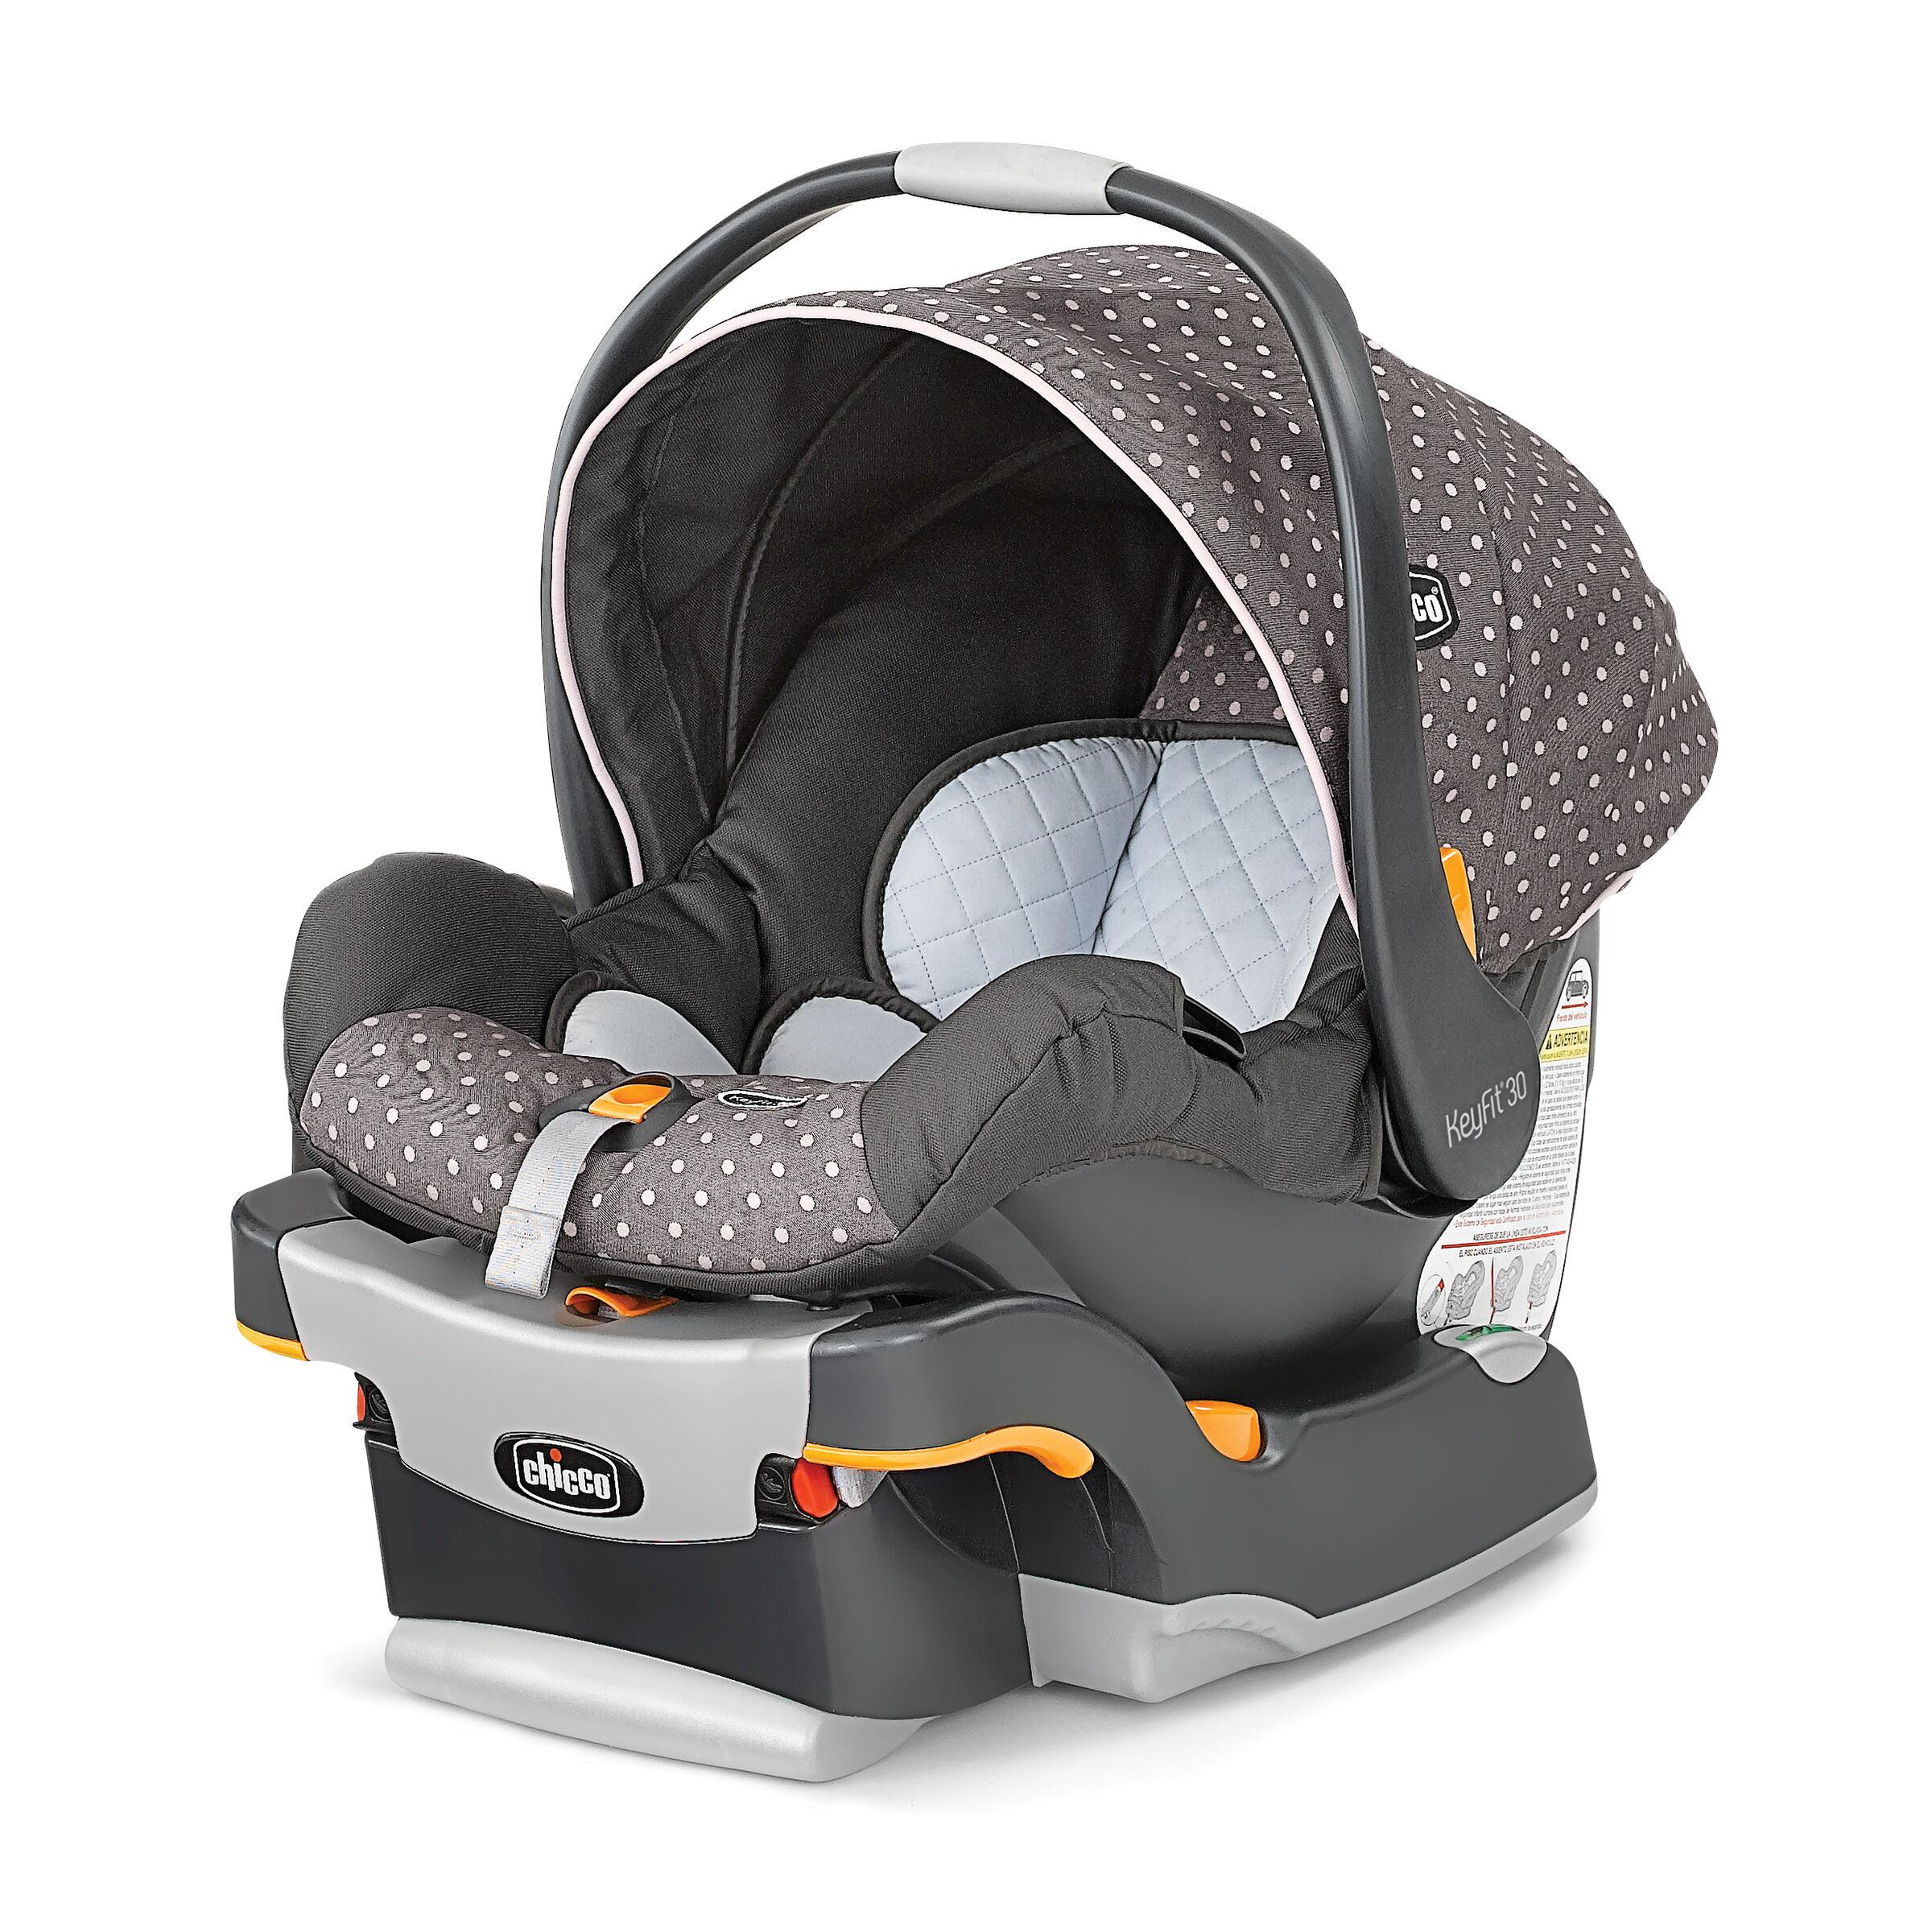 keyfit30 infant car seat lilla chicco rh chiccousa com chicco keyfit 30 car seat instruction manual chicco keyfit 30 car seat manual